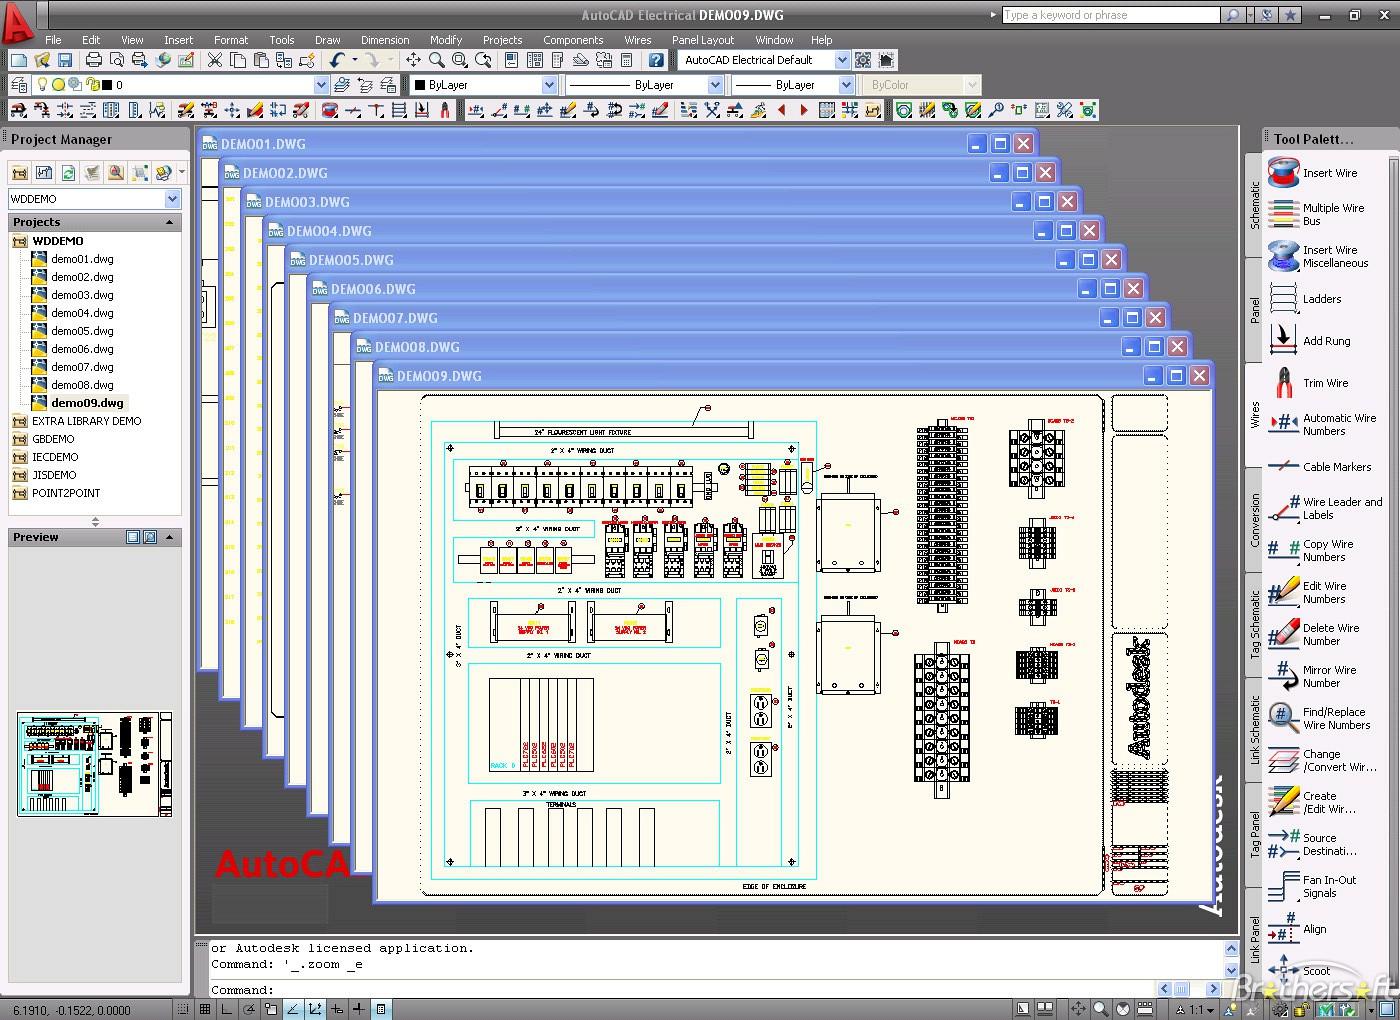 Autodesk autocad electrical 2014 buy online